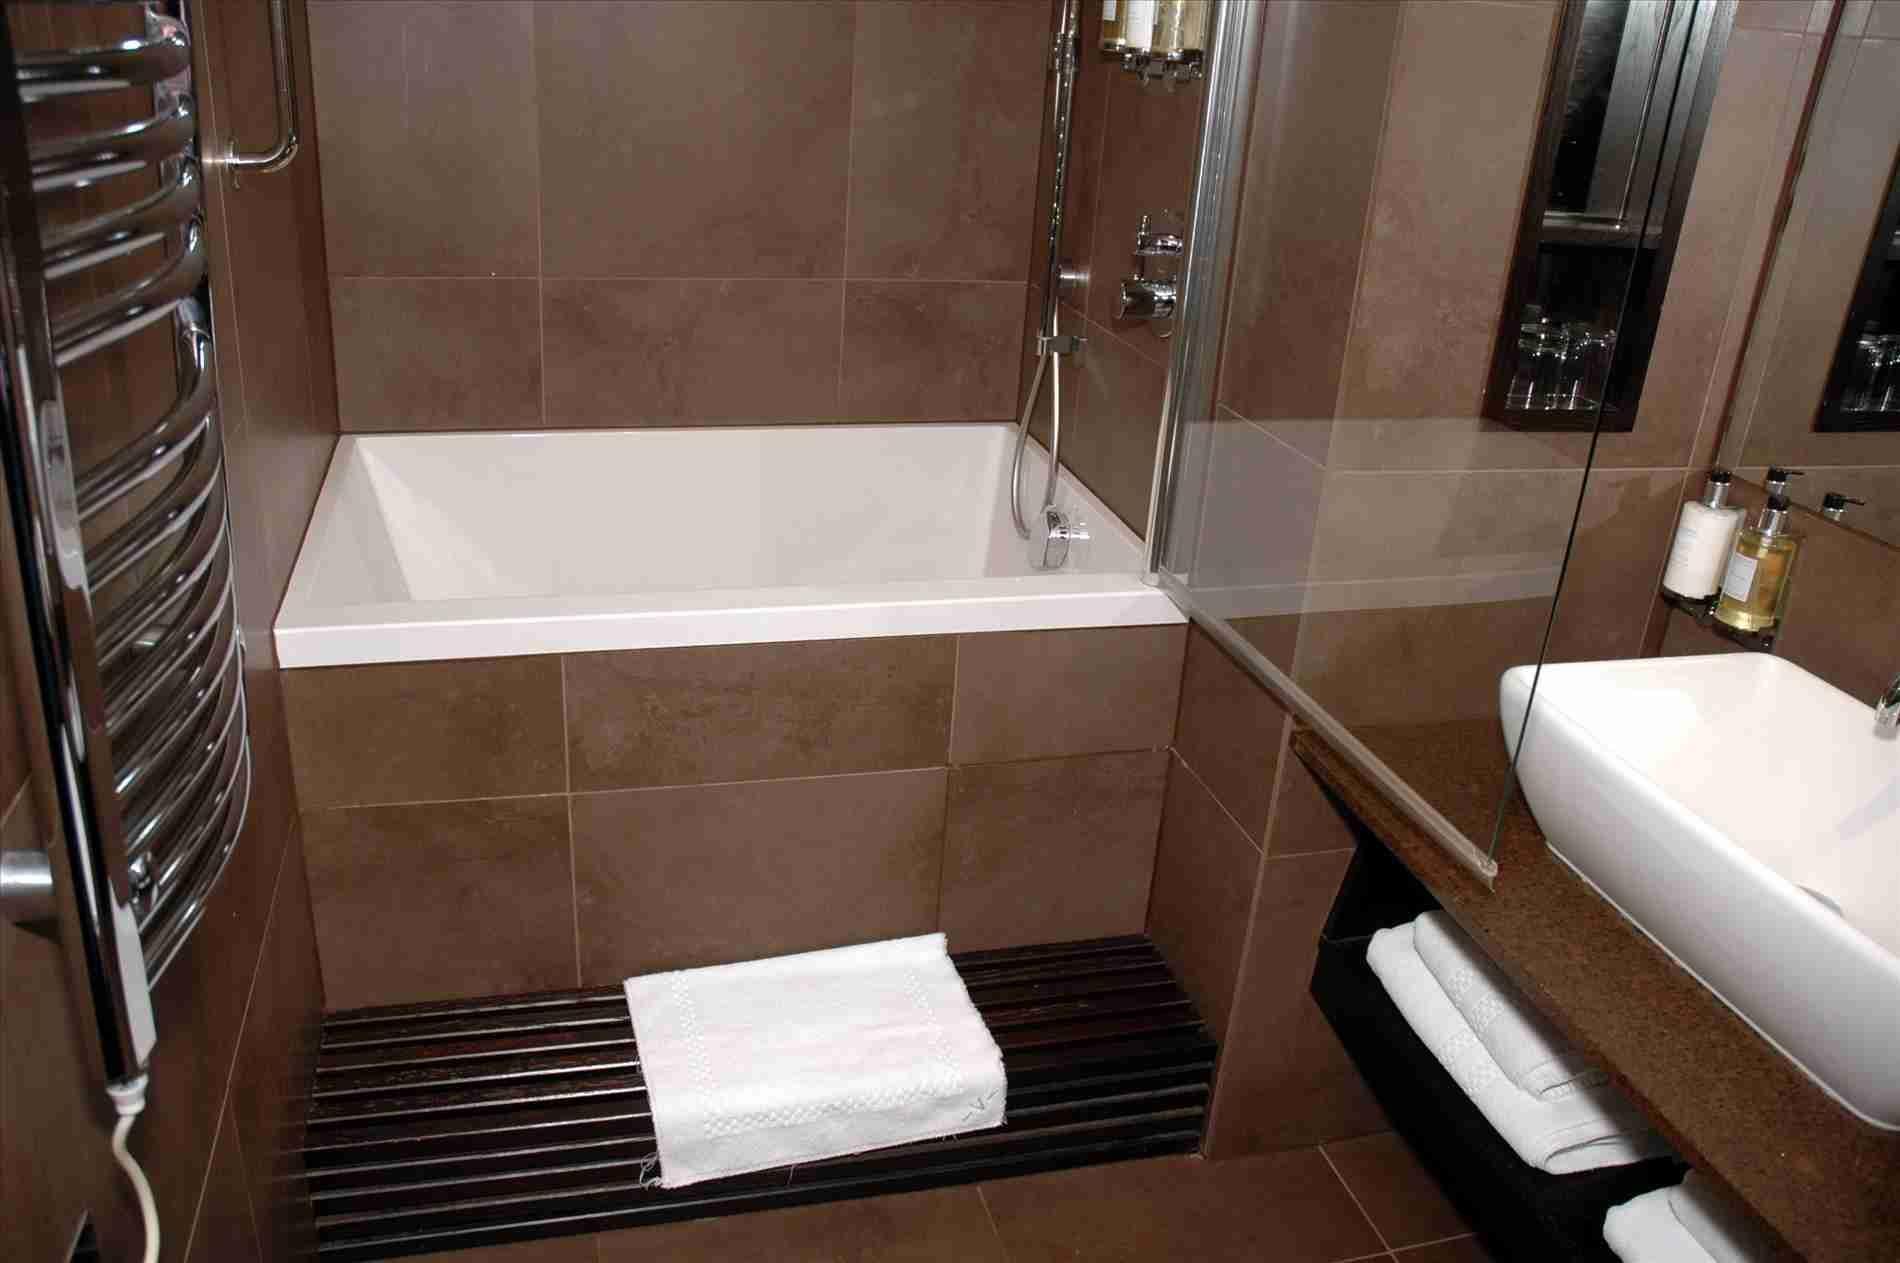 Dorable Narrow Bathtub Dimensions Image Collection - Bathtubs For ...